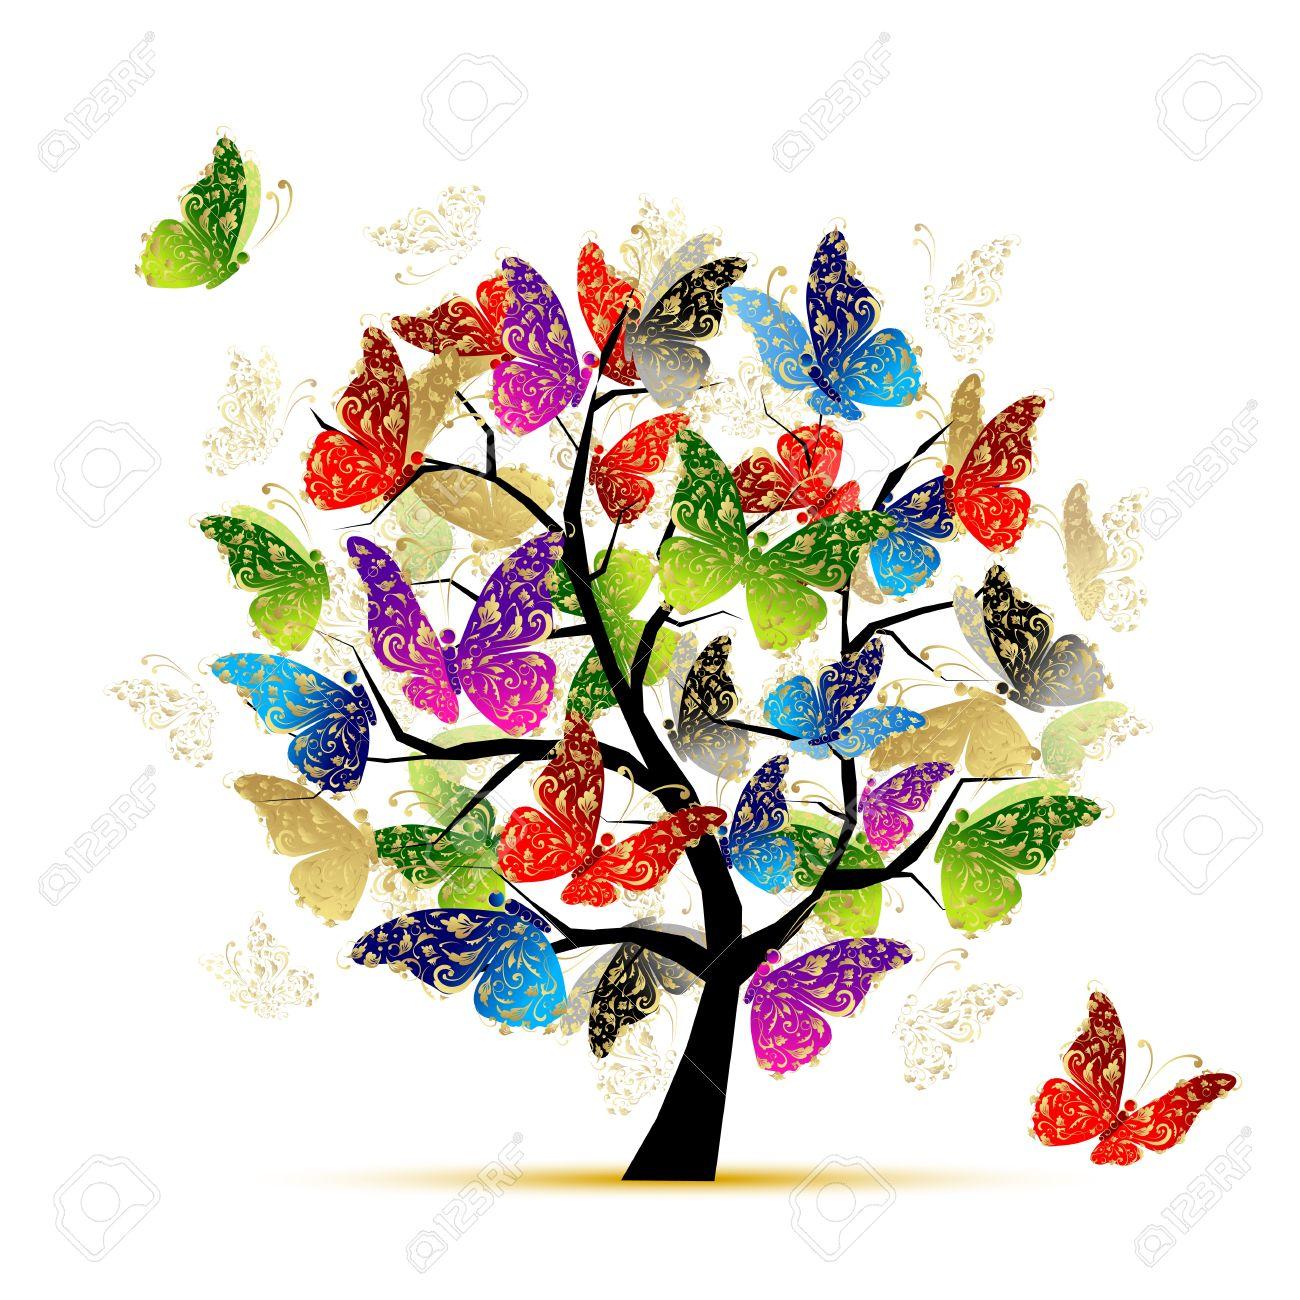 Tree Of Life Clip Art-Tree of Life Clip Art-13